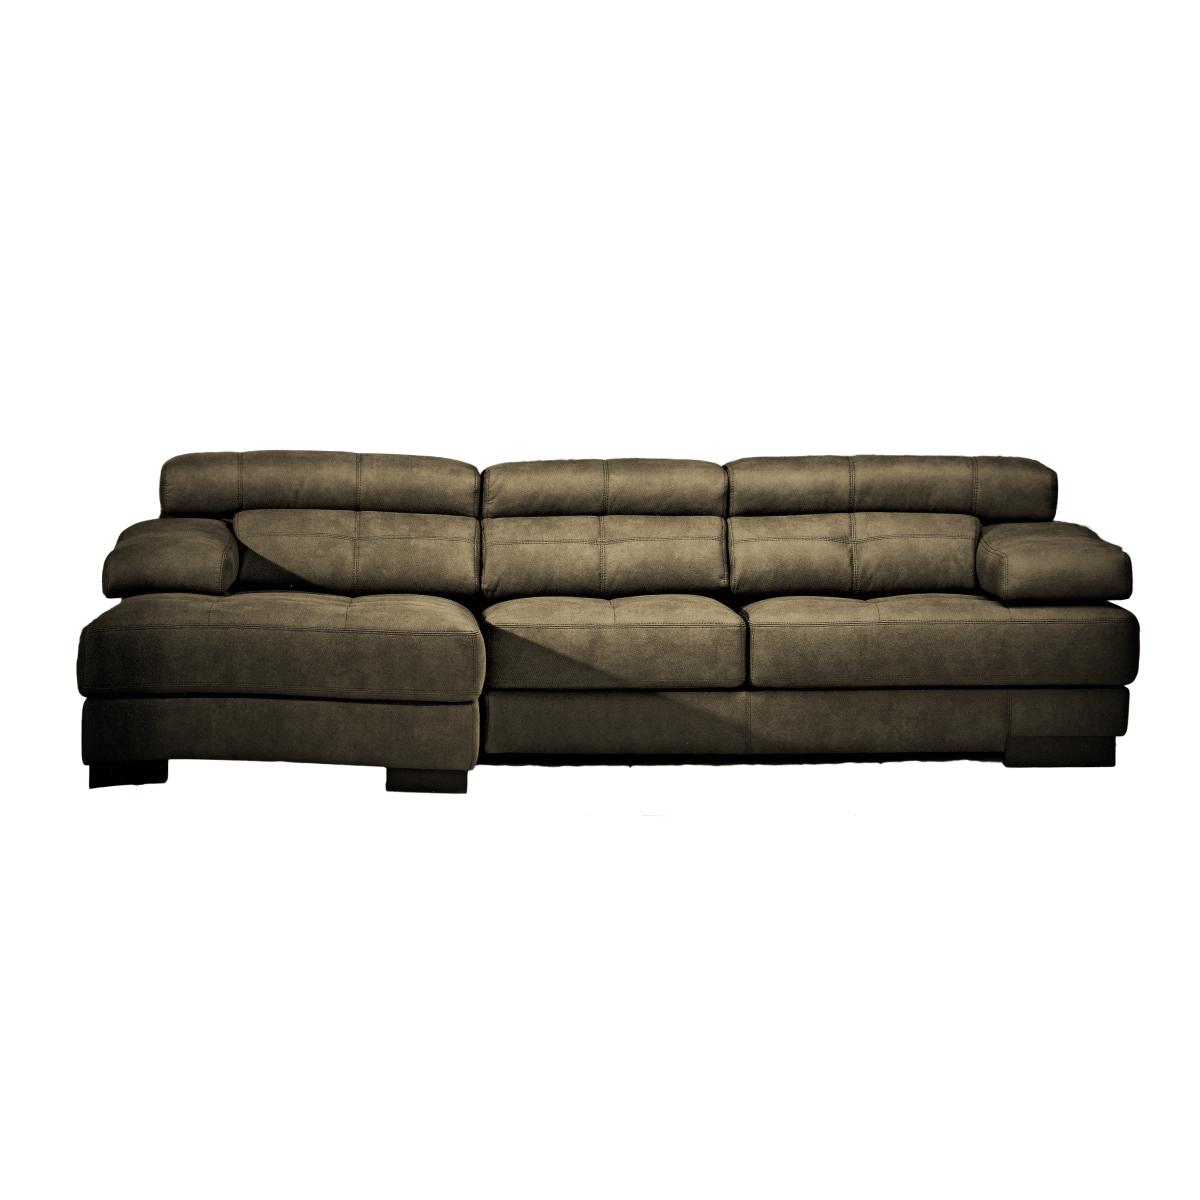 Sof chaise longue impac tienda de sofas en pamplona - Sofas galerias del tresillo ...